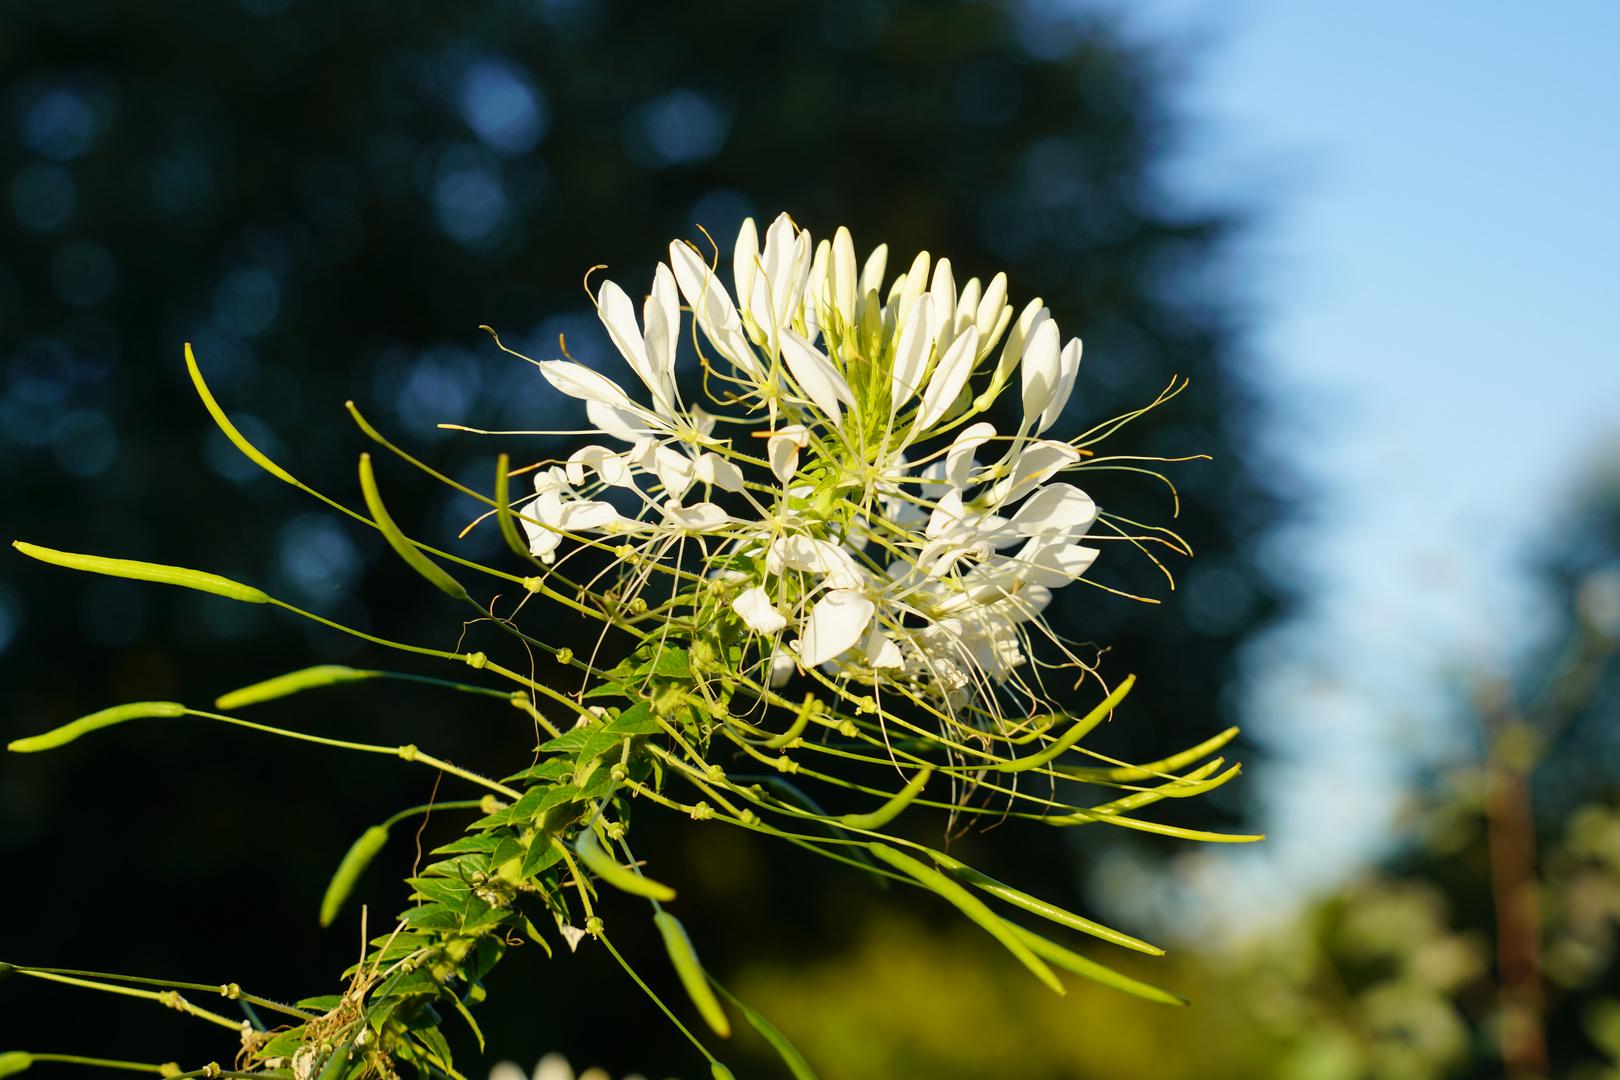 Cleome - Spinnenpflanze